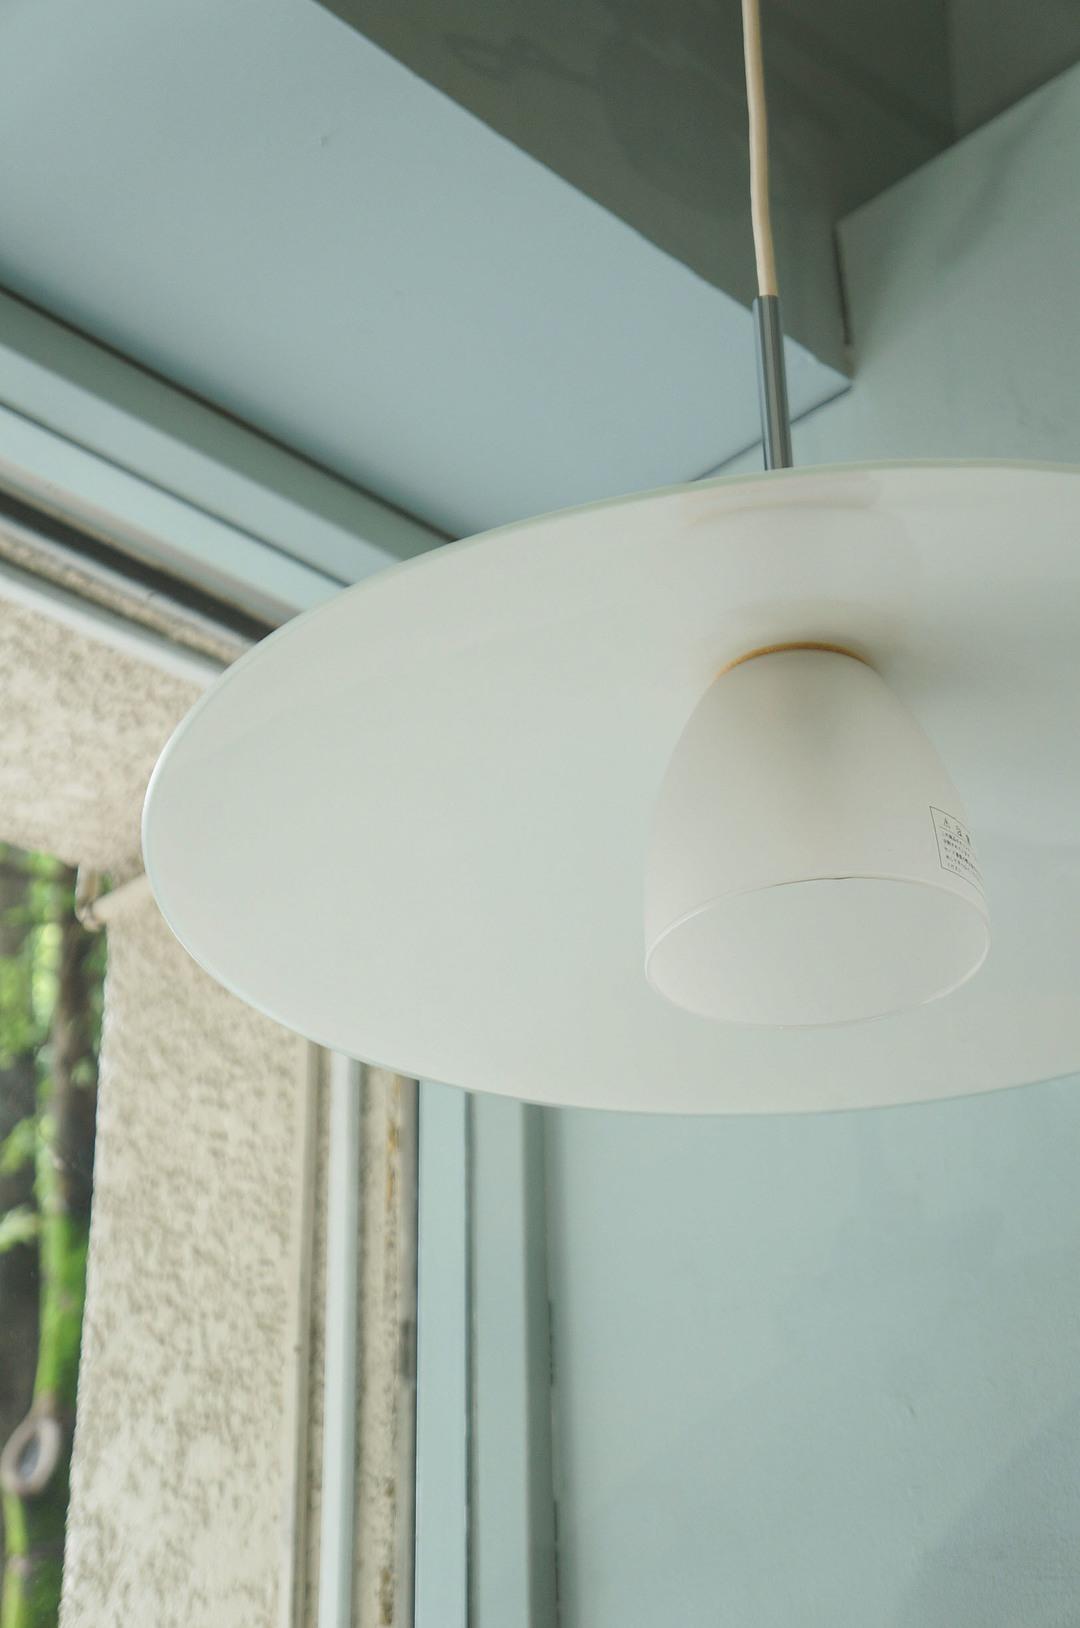 Yamagiwa Glass Shade Pendant Light/ヤマギワ ガラスシェード ペンダントライト 照明 北欧モダン